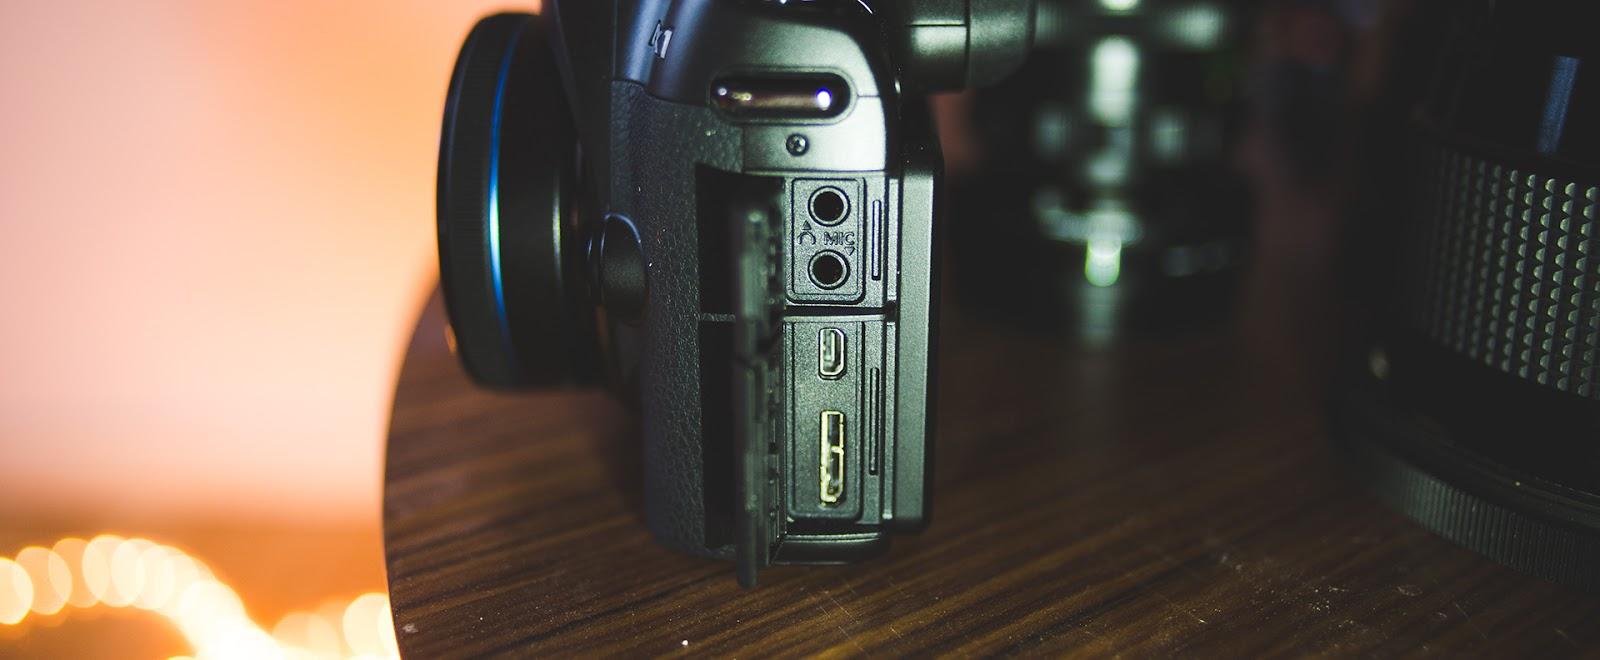 Fungsi HDMI Out Pada Kamera